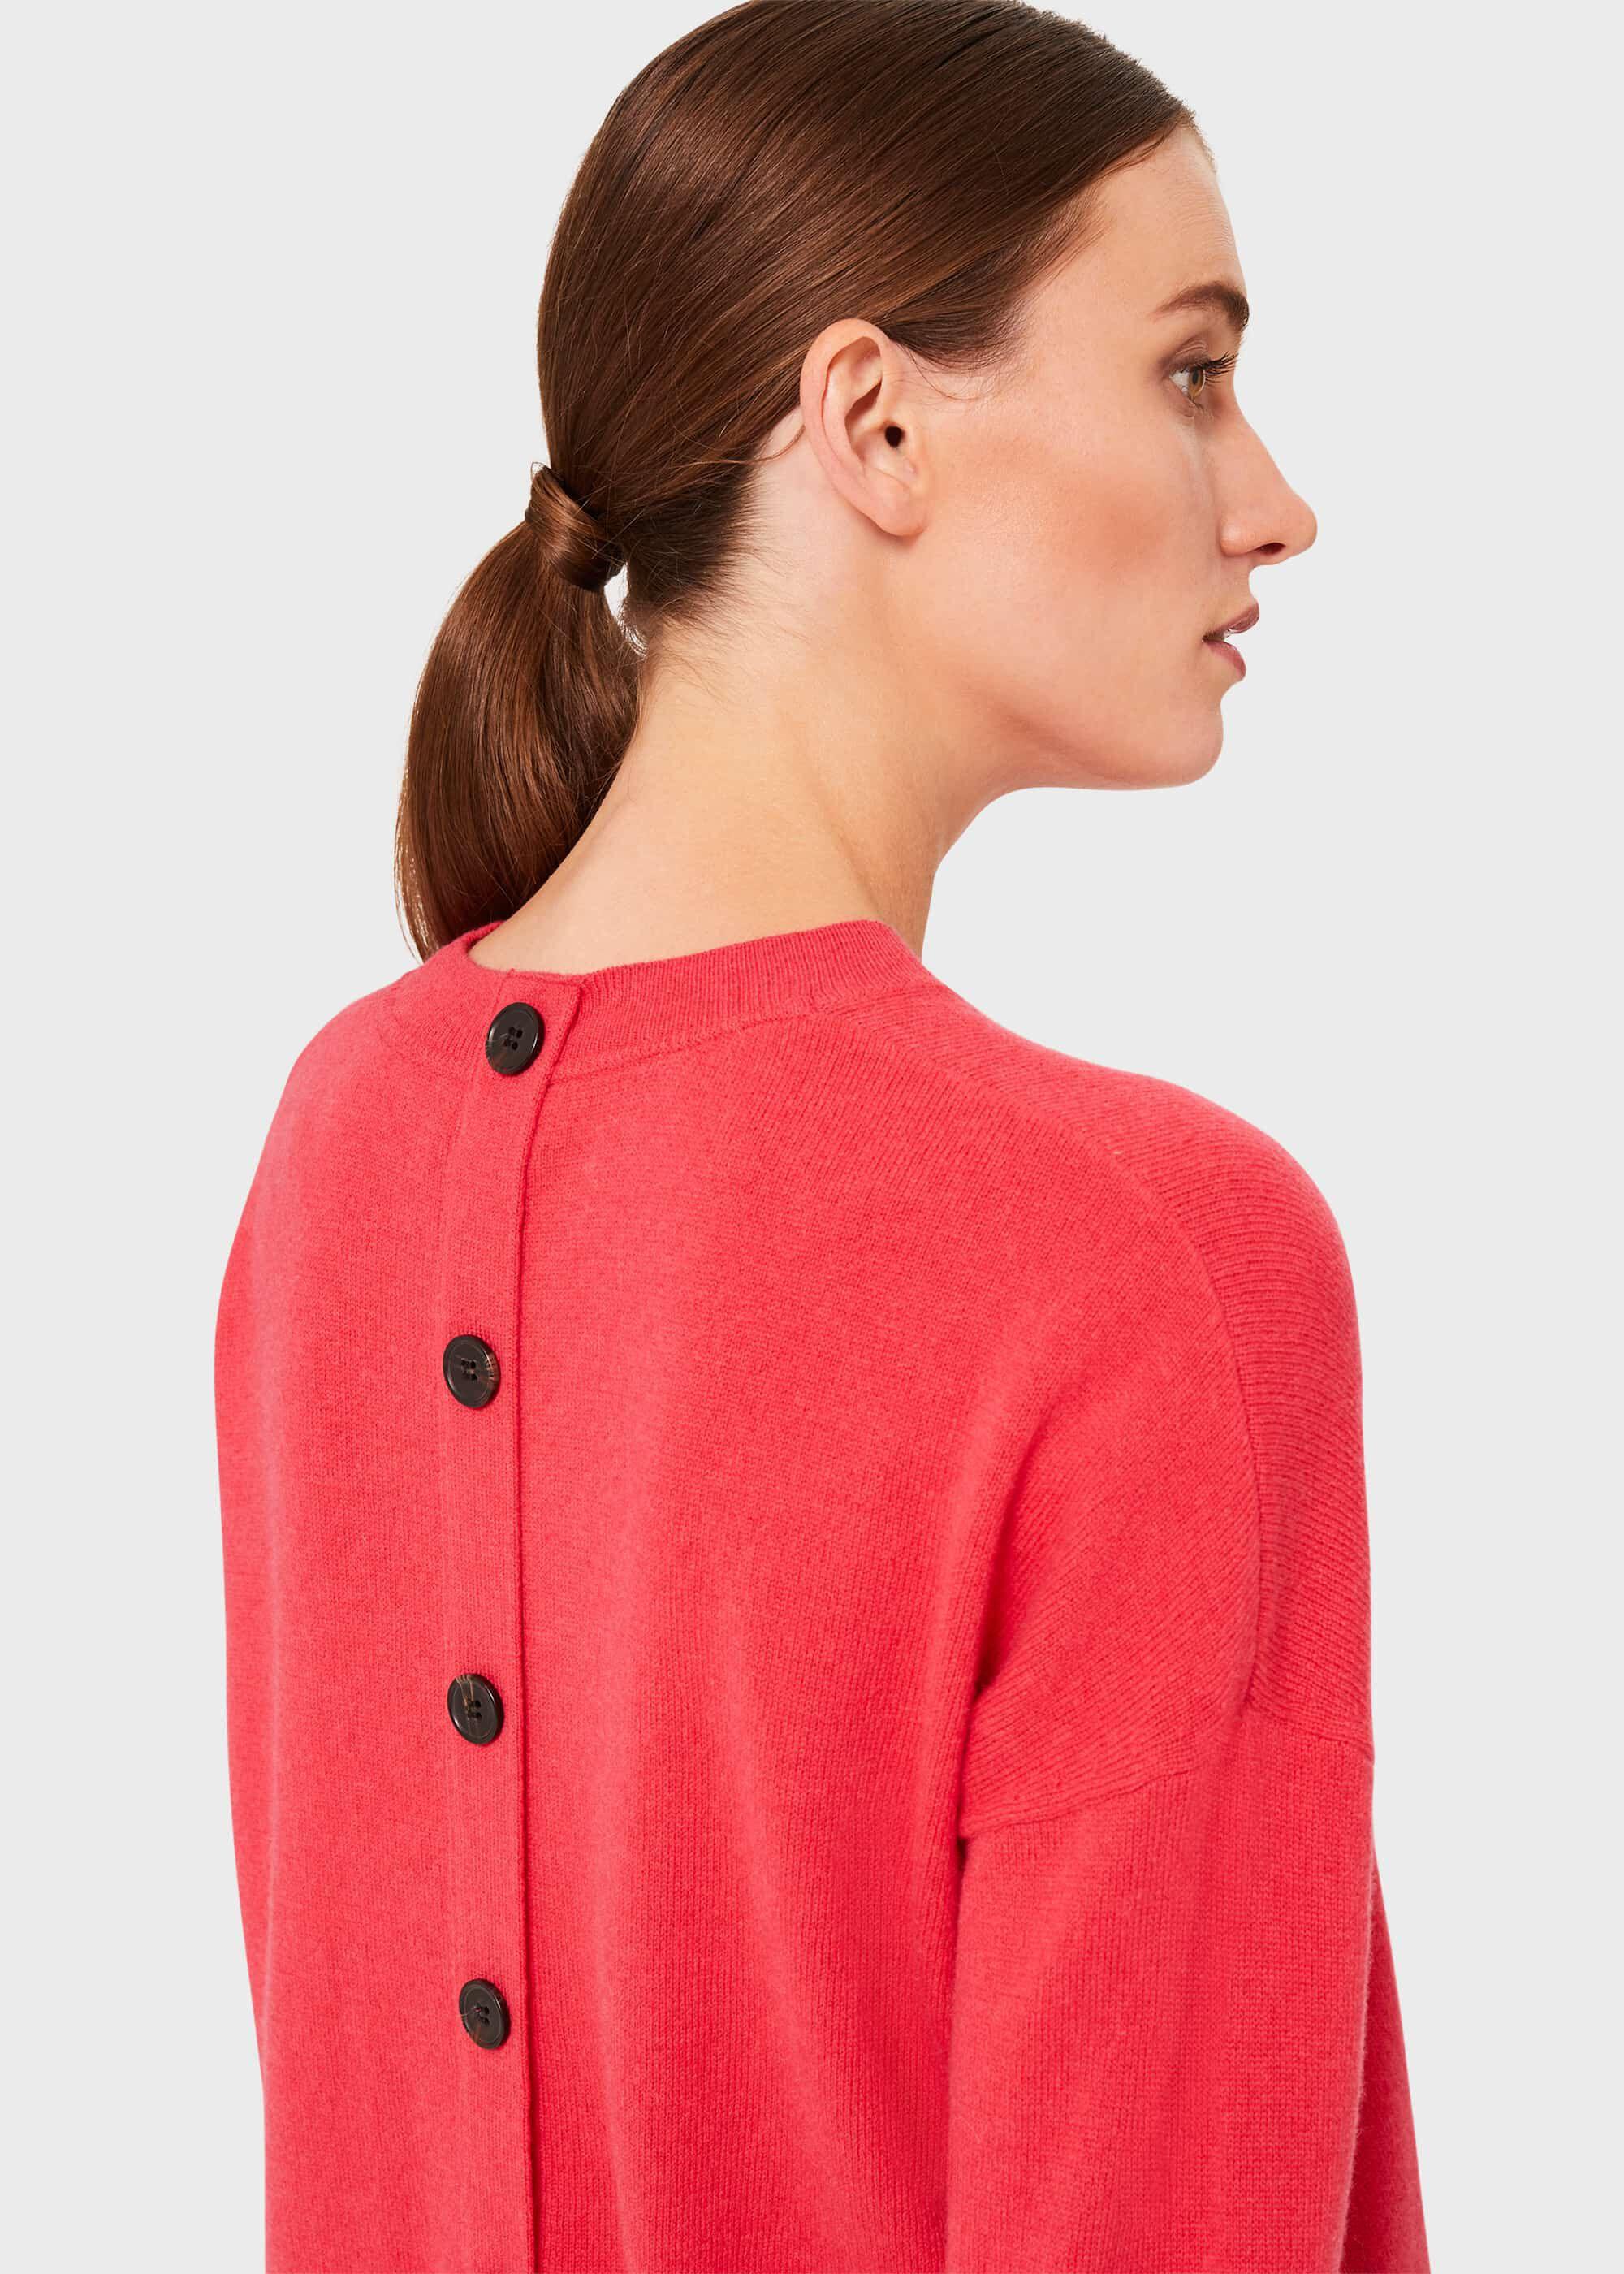 Lydia Wool Cashmere Sweater